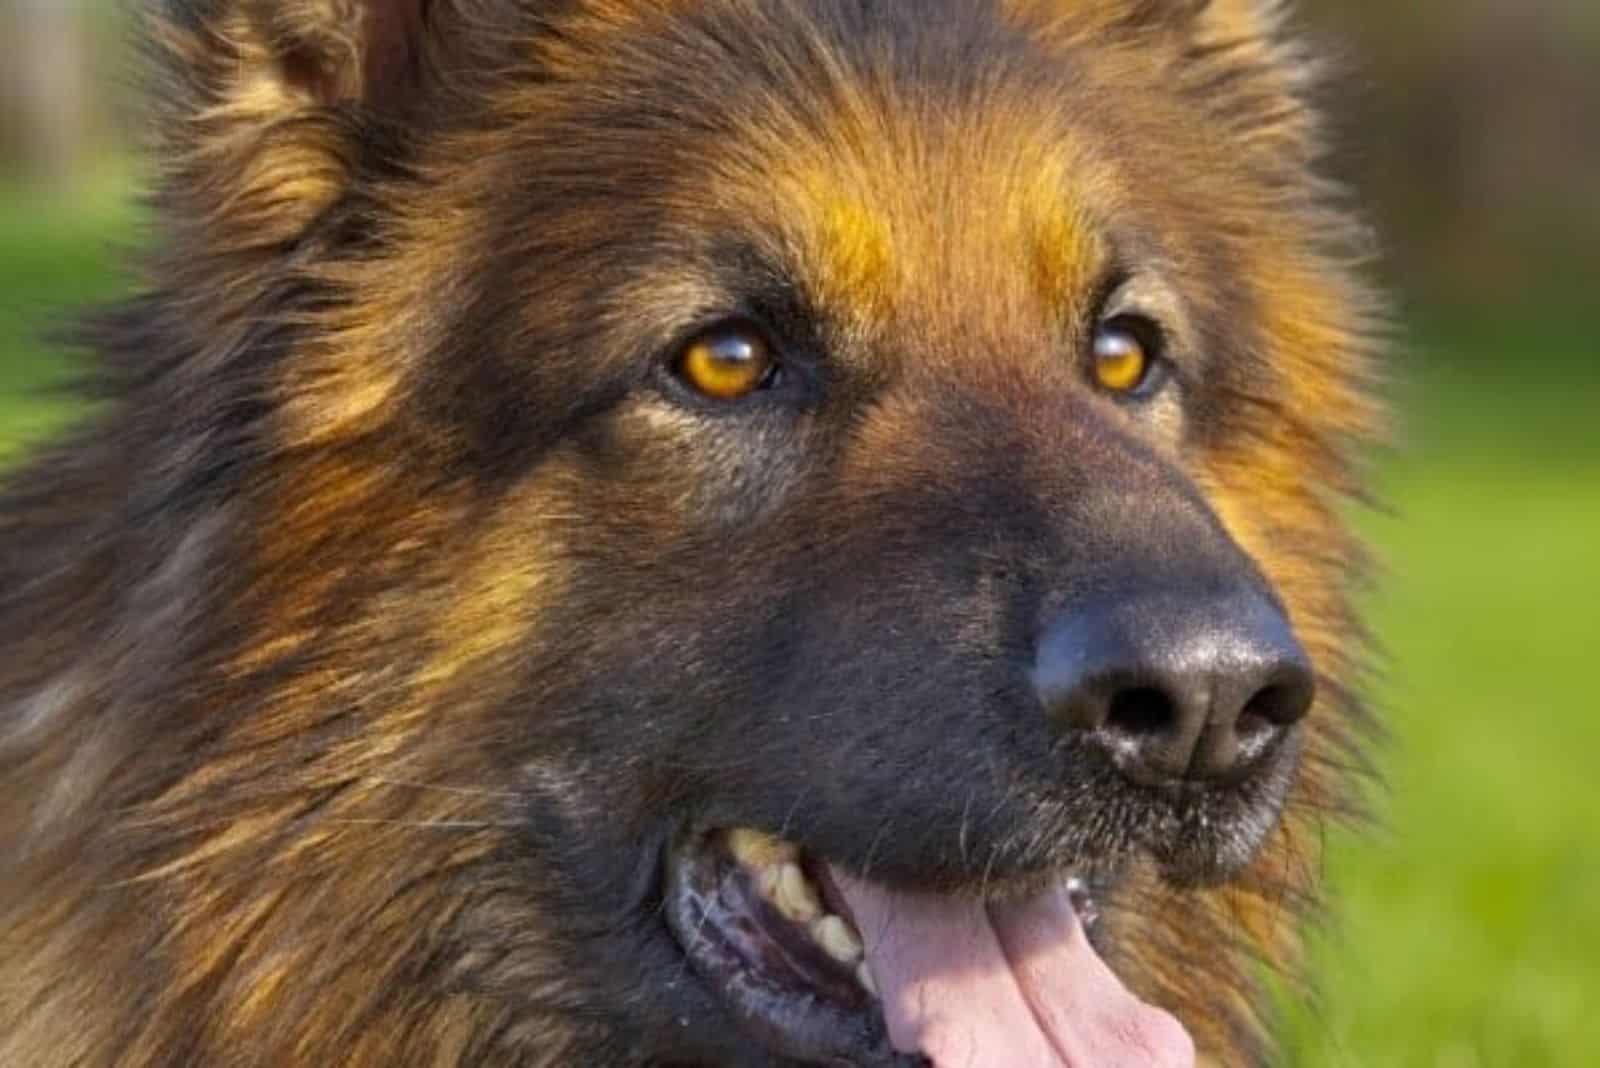 a portrait of a beautiful crossbreed dog